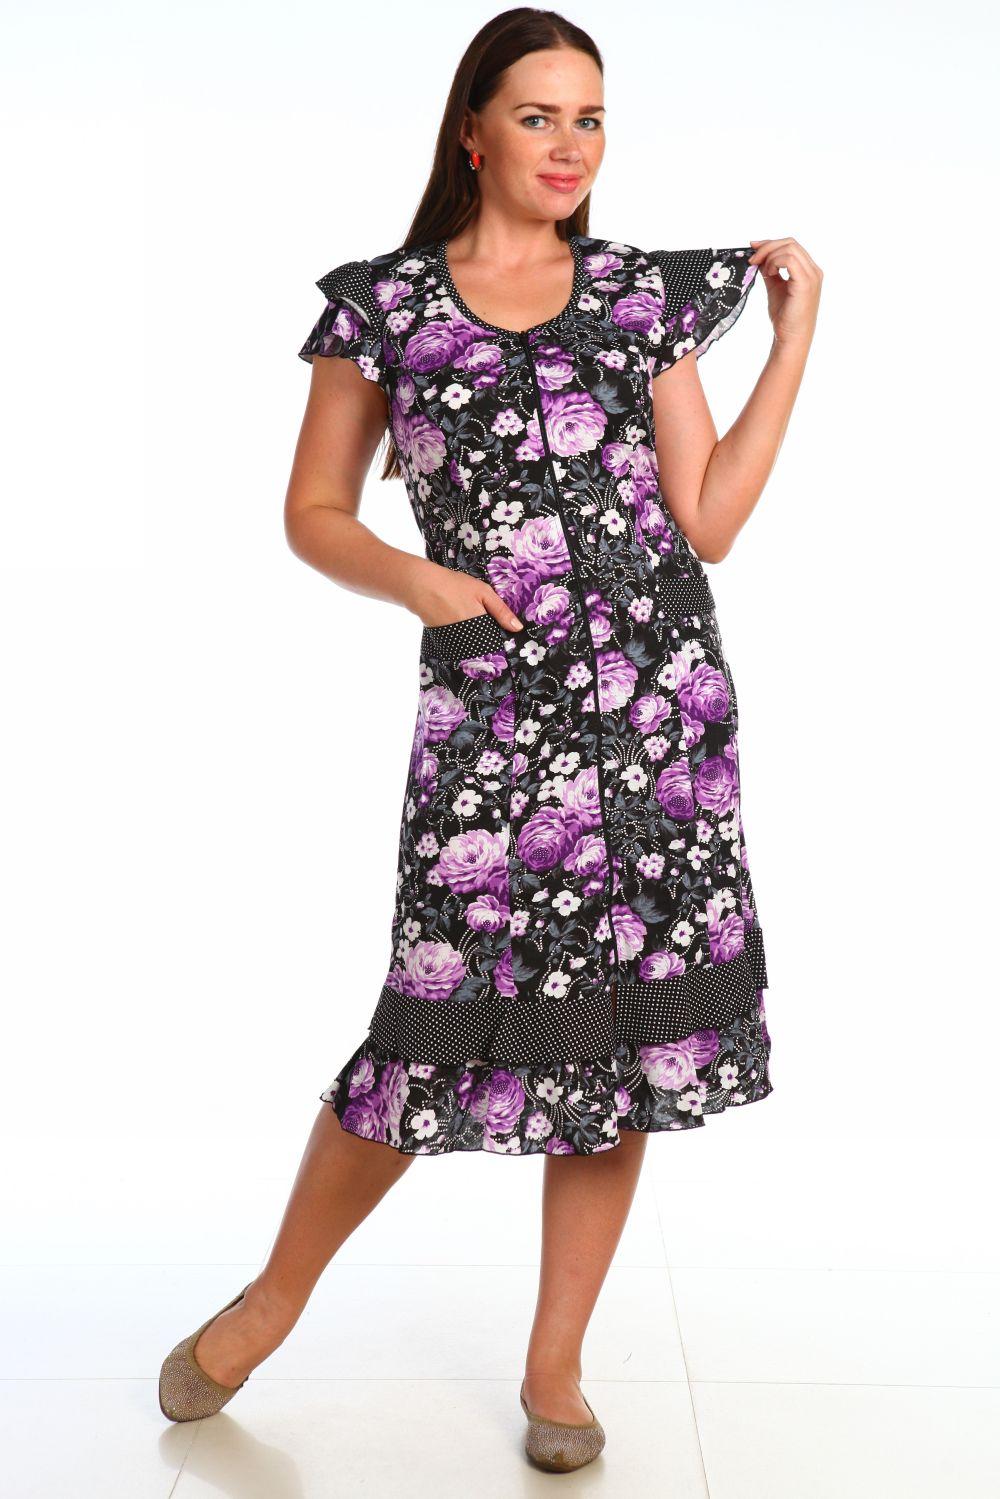 Халат женский Стрекоза без рукаваДомашняя одежда<br><br><br>Размер: 66